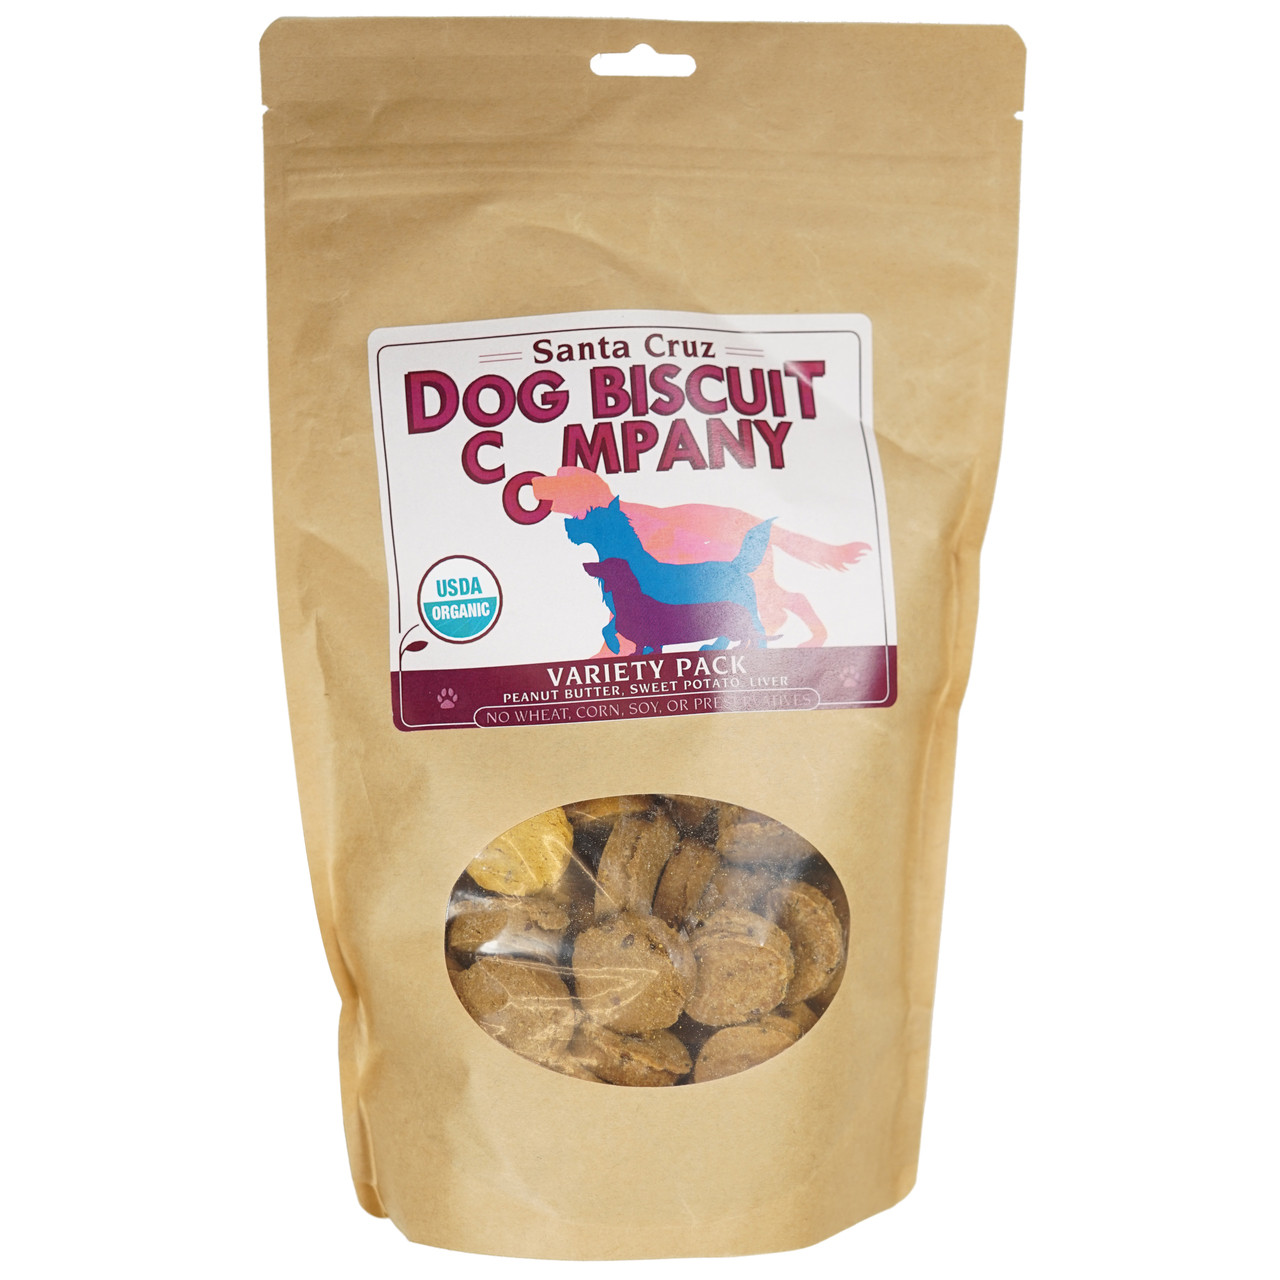 Santa Cruz Dog Biscuit Company Variety Pack Dog Biscuits